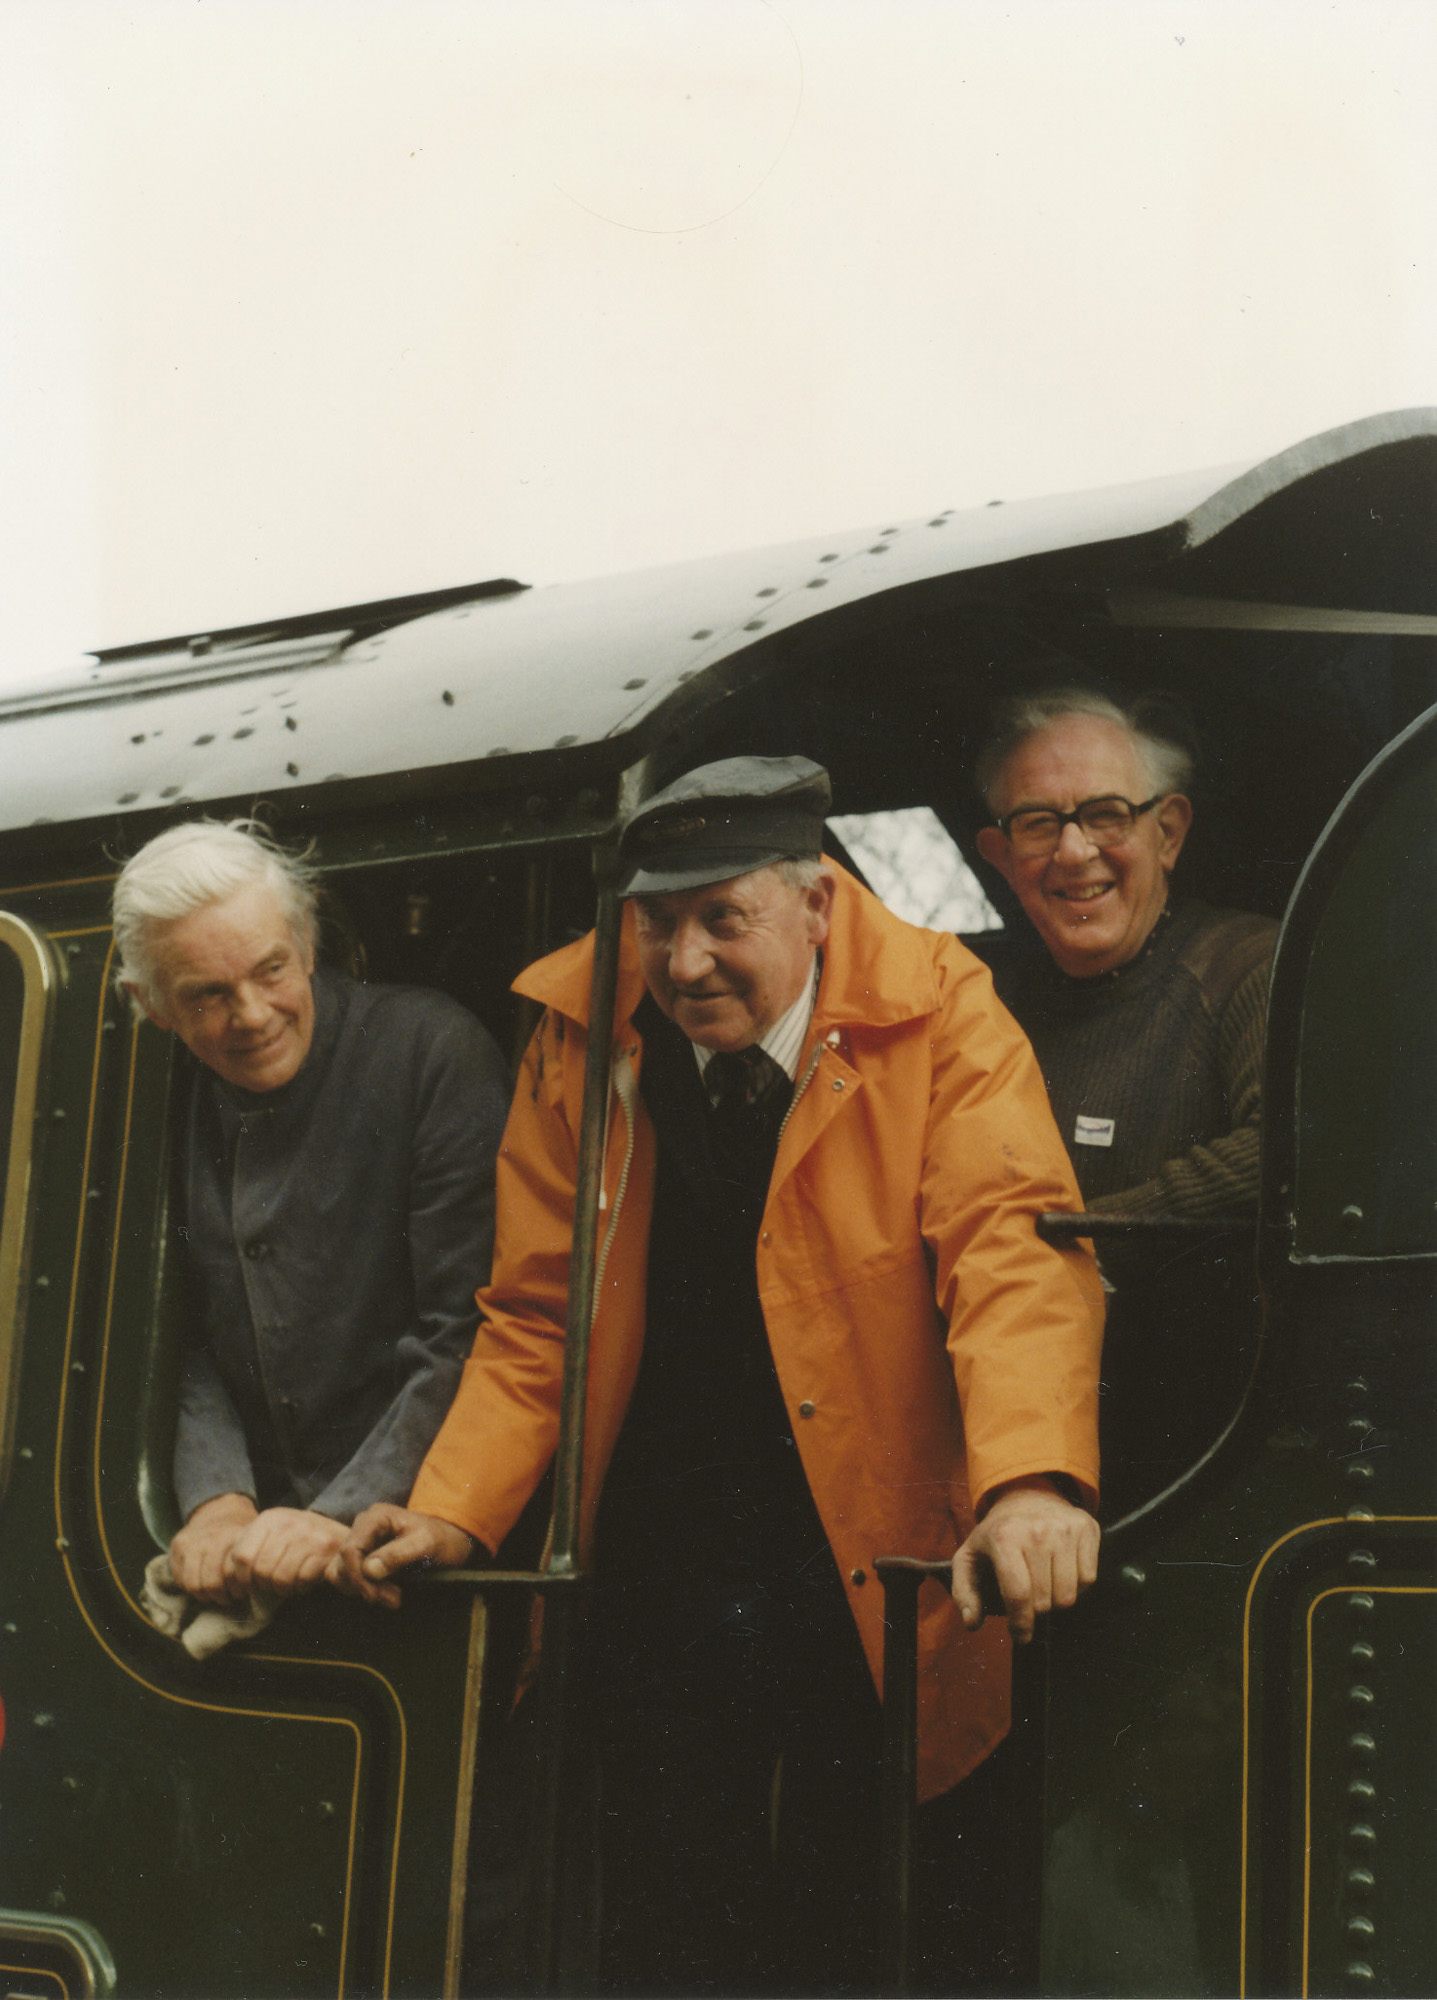 Ted Feasey, Dick Whittington & Dick Hardy. © Bob Robson/6024PS Ltd